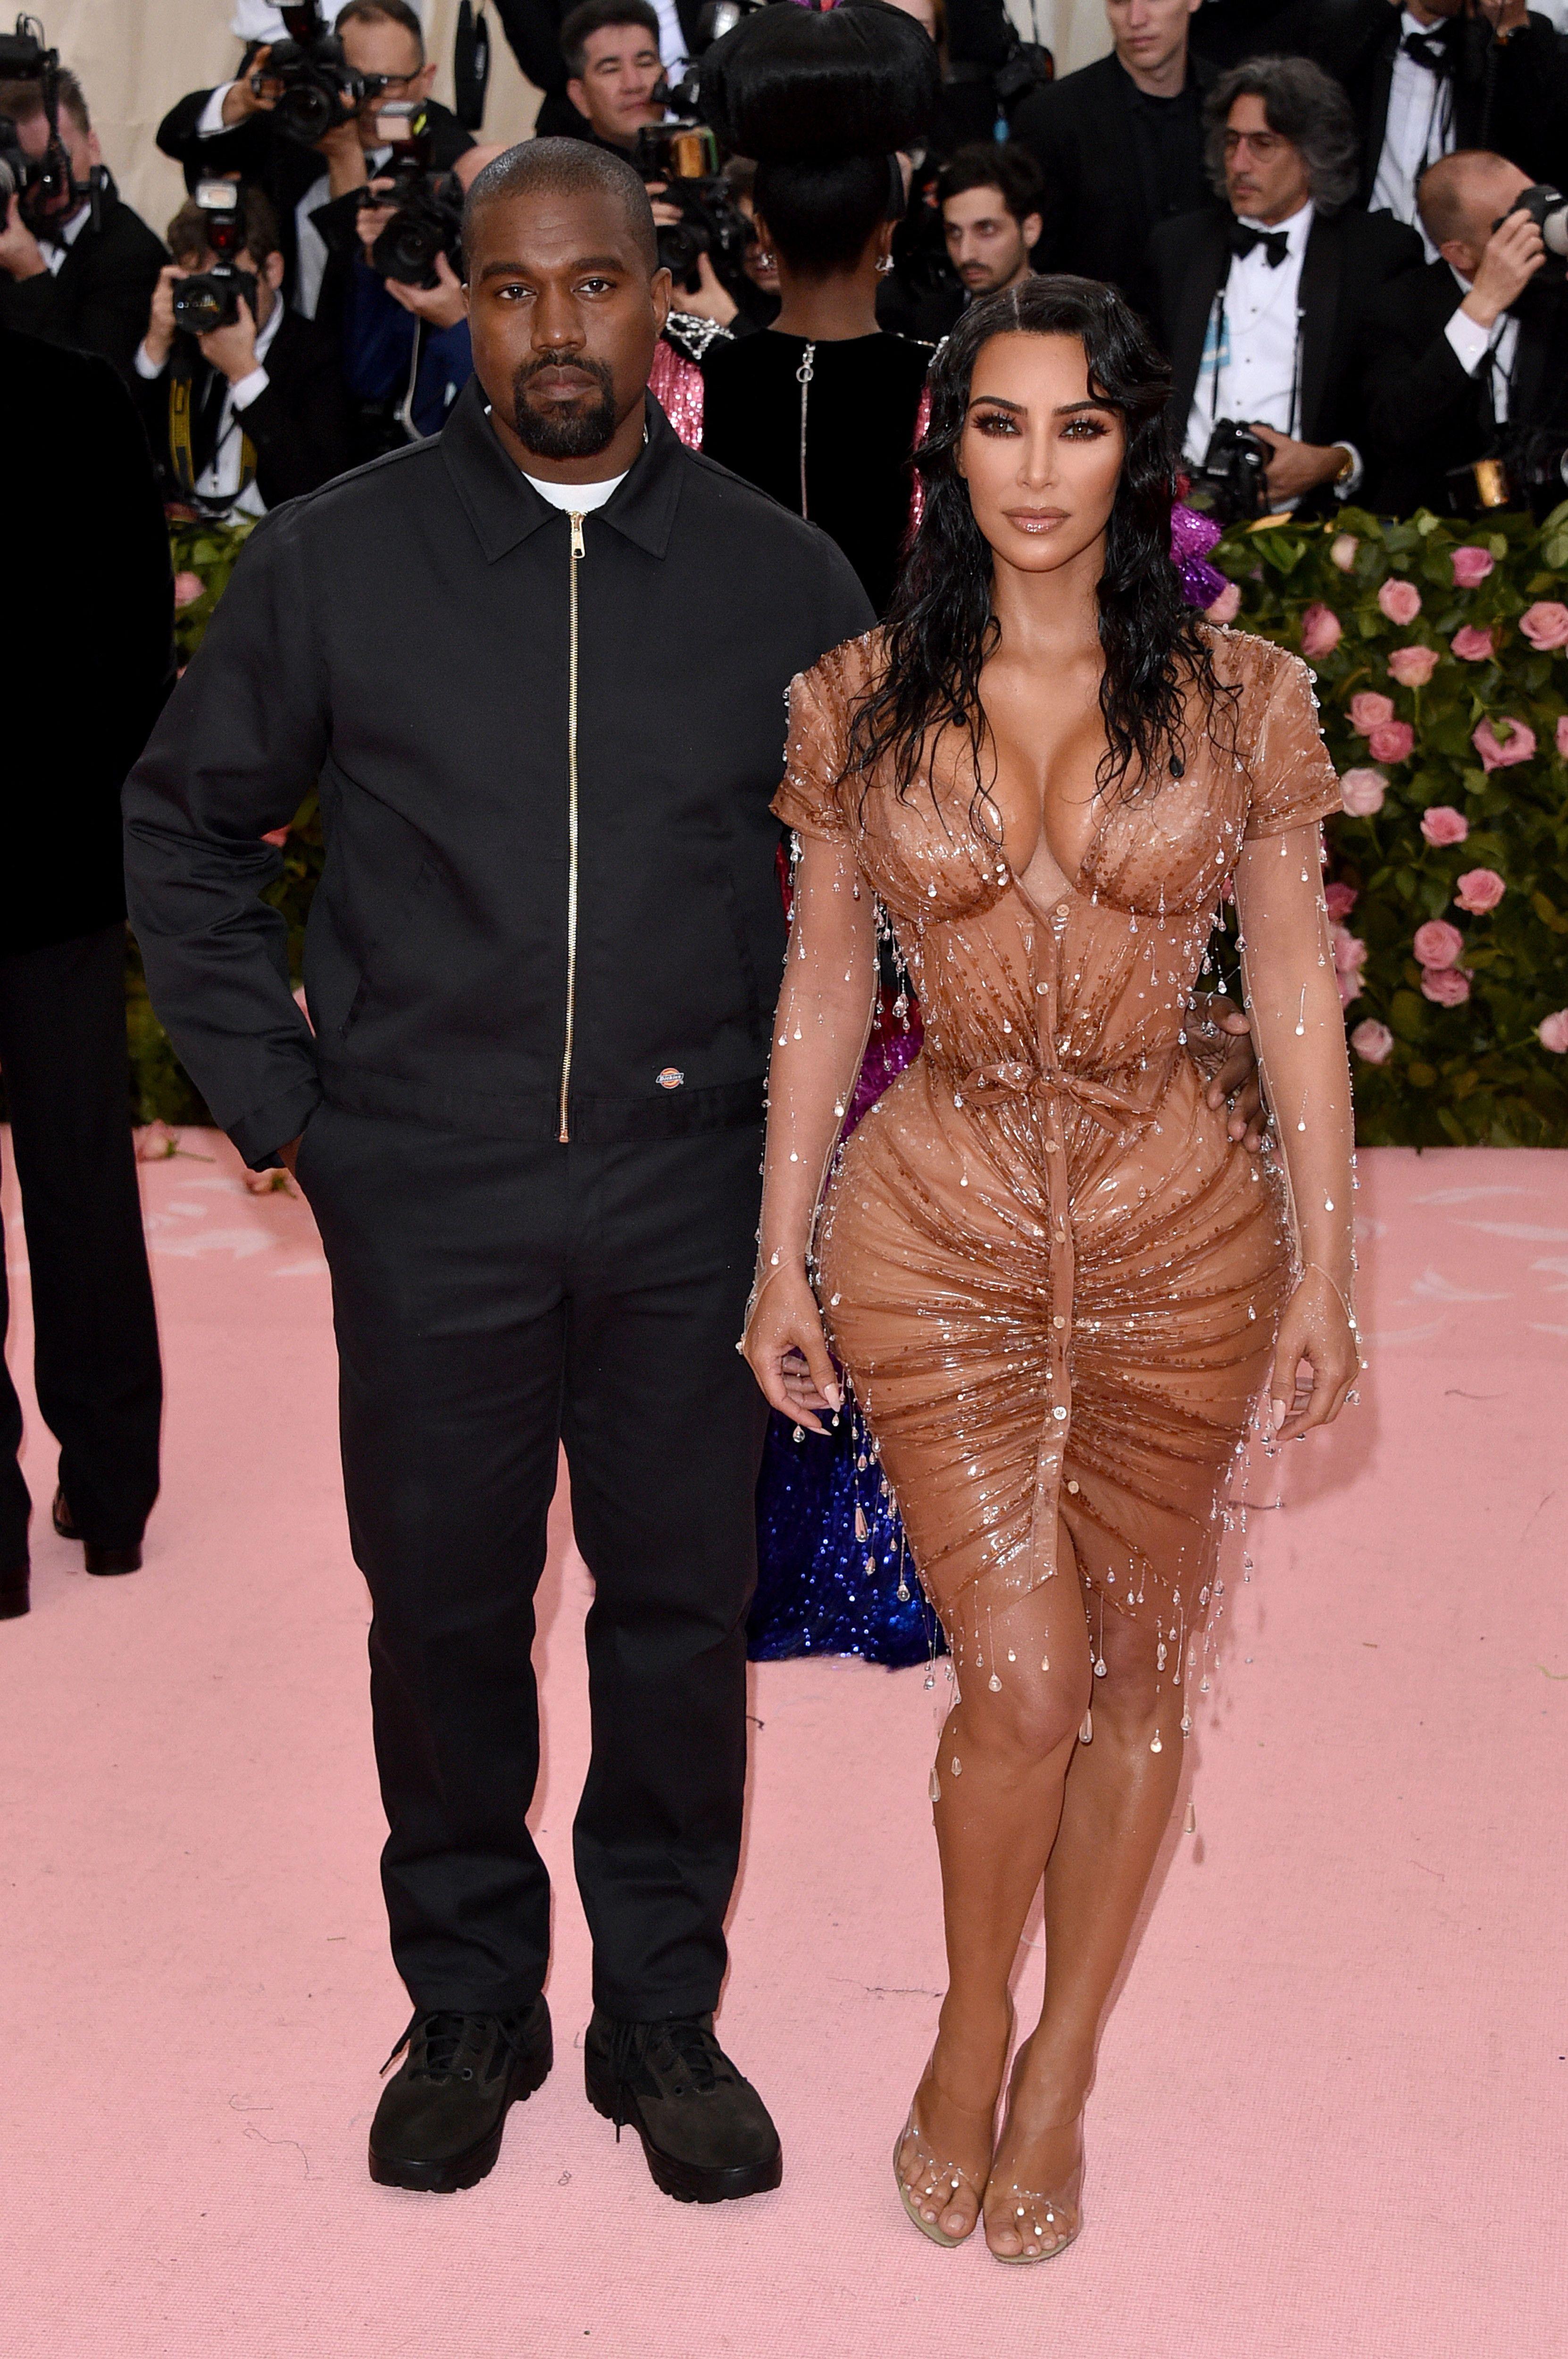 Every Single Look From The 2019 Met Gala Met Gala Kim Kardashian And Kanye Met Gala Red Carpet